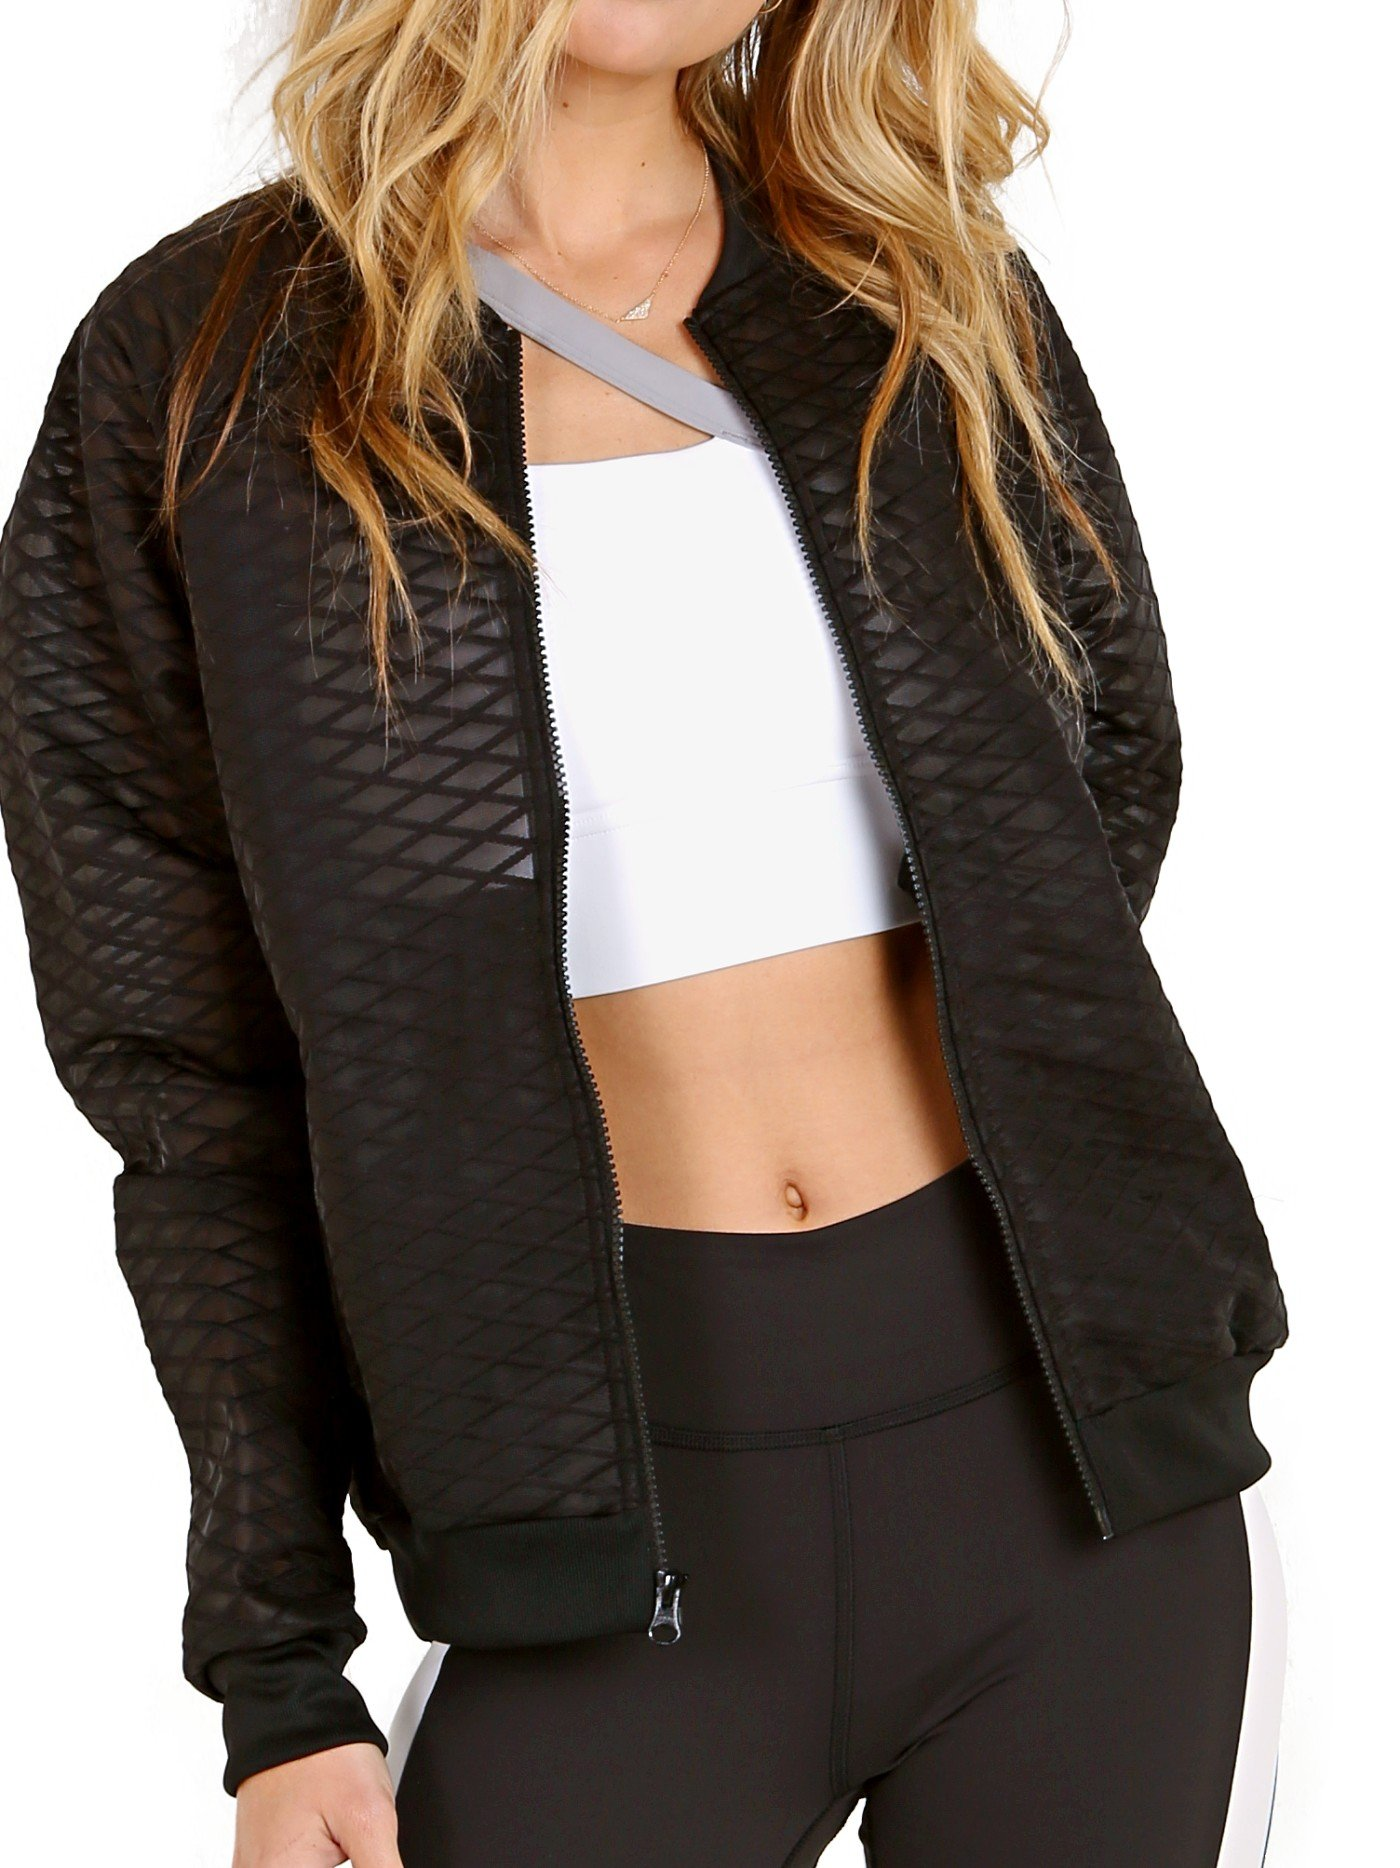 Reebok Women's Mesh Bomber Jacket, Black, Small